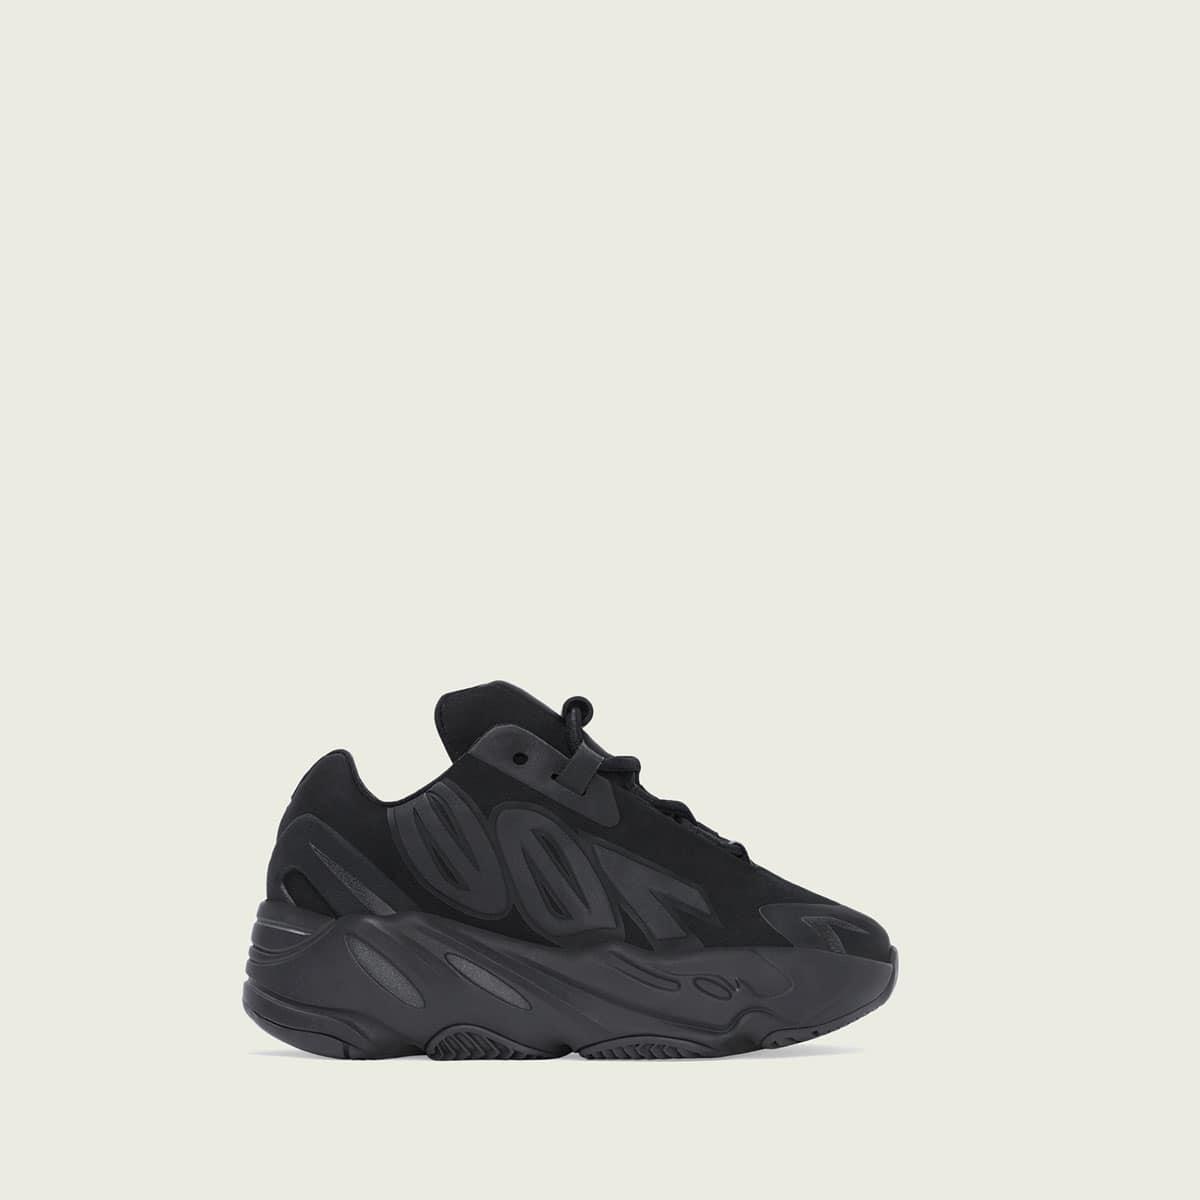 "adidas YZY 700 MNVN INFANTS ""TRIPLE BLACK"" BLACK/BLACK/BLACK 20SS-S_photo_large"